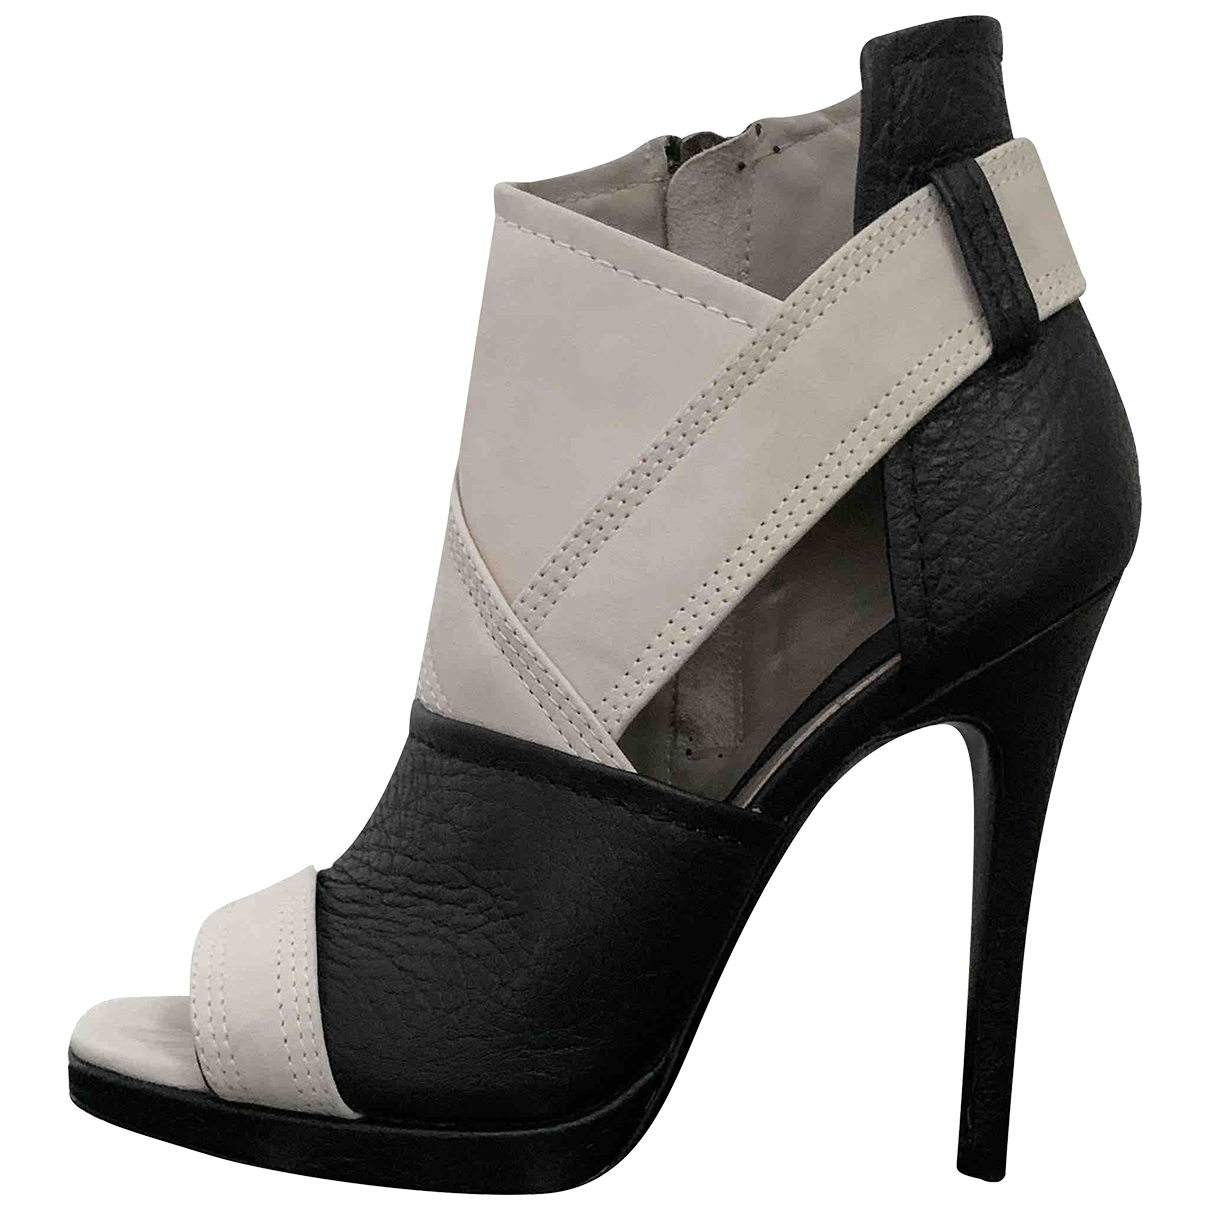 Mcq \N Black Leather Sandals for Women 38 EU